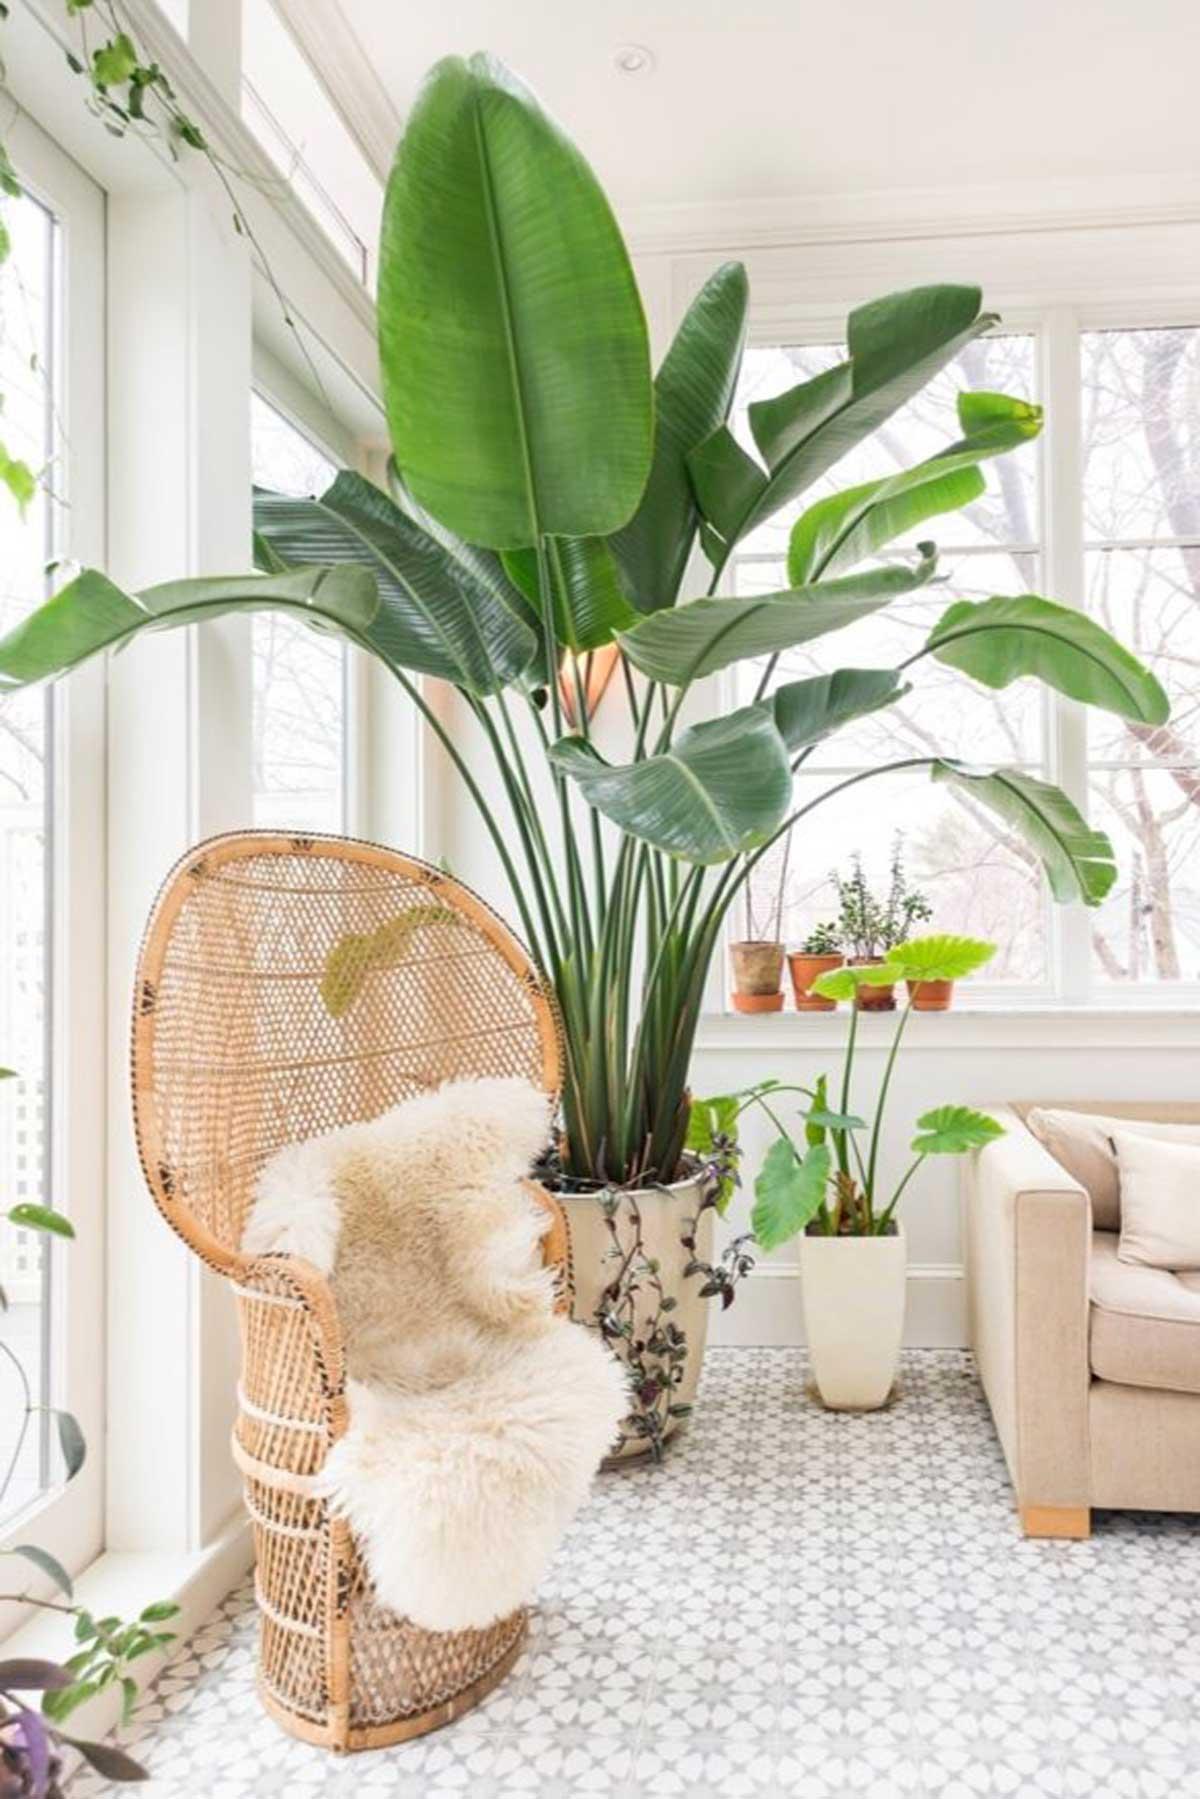 Indoor Plants A Complete Guide On The Best Indoor Plants